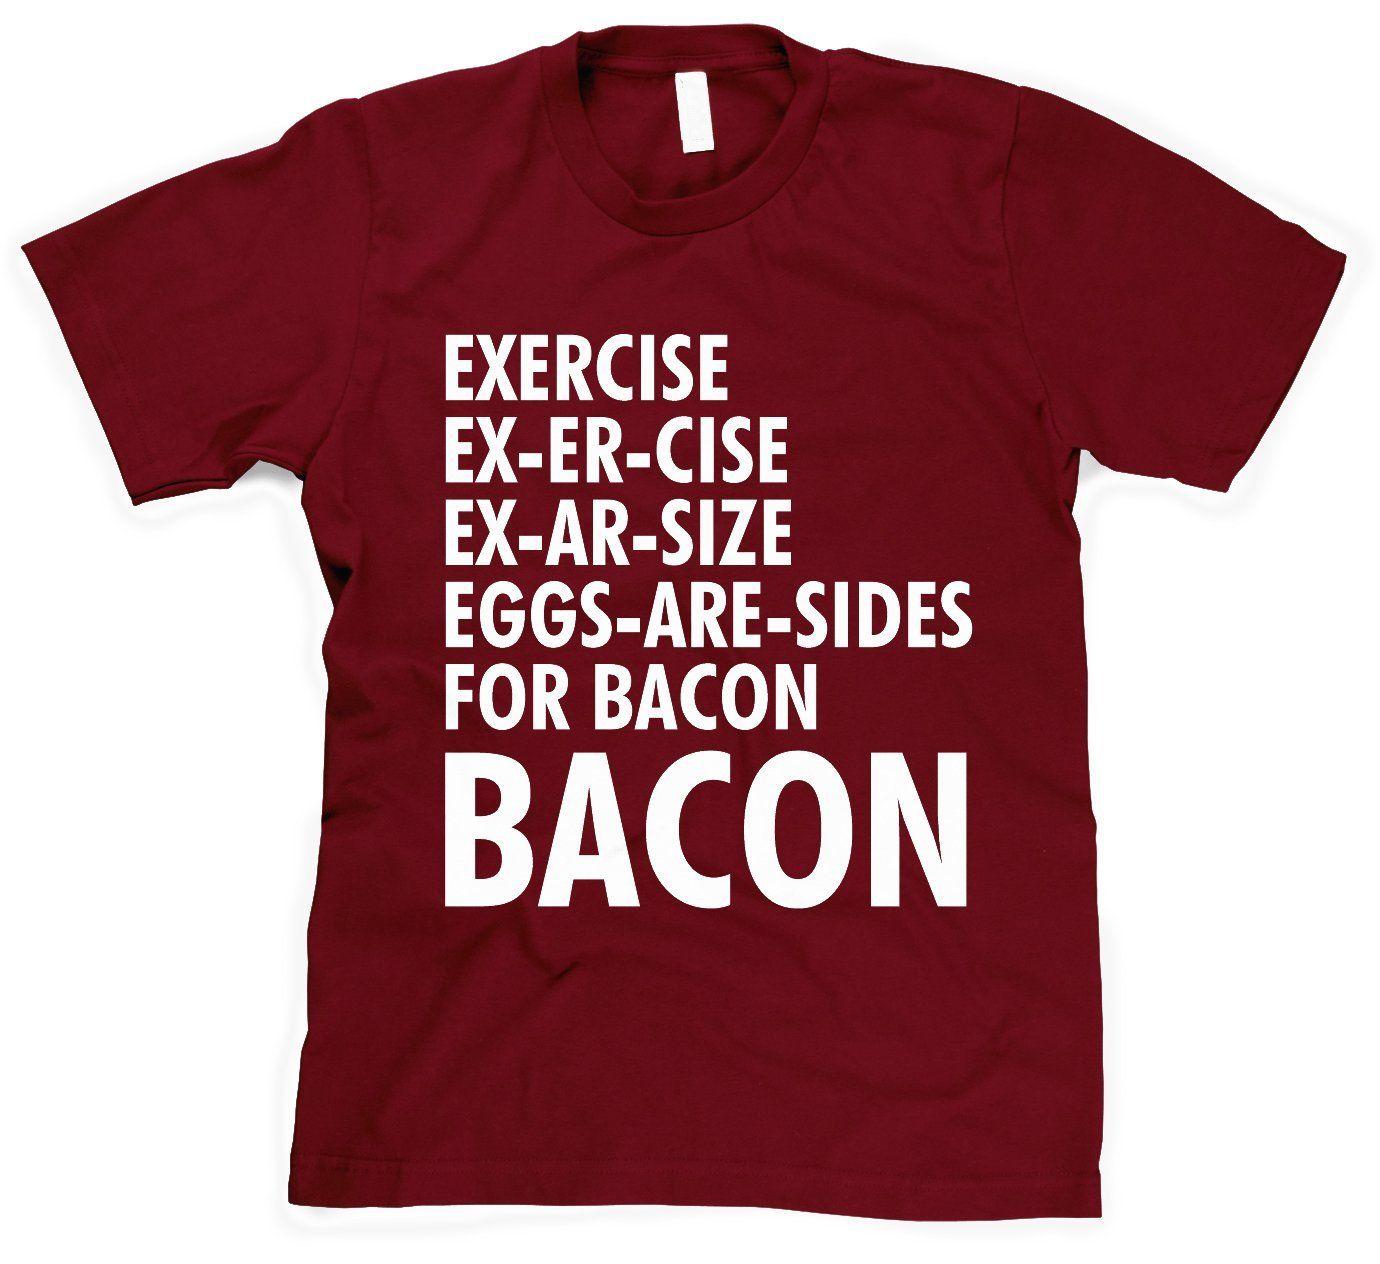 526b6d7fcd80237b98e3d781789e6a62 exercise bacon t shirt funny lazy breakfast tee christmas stuff